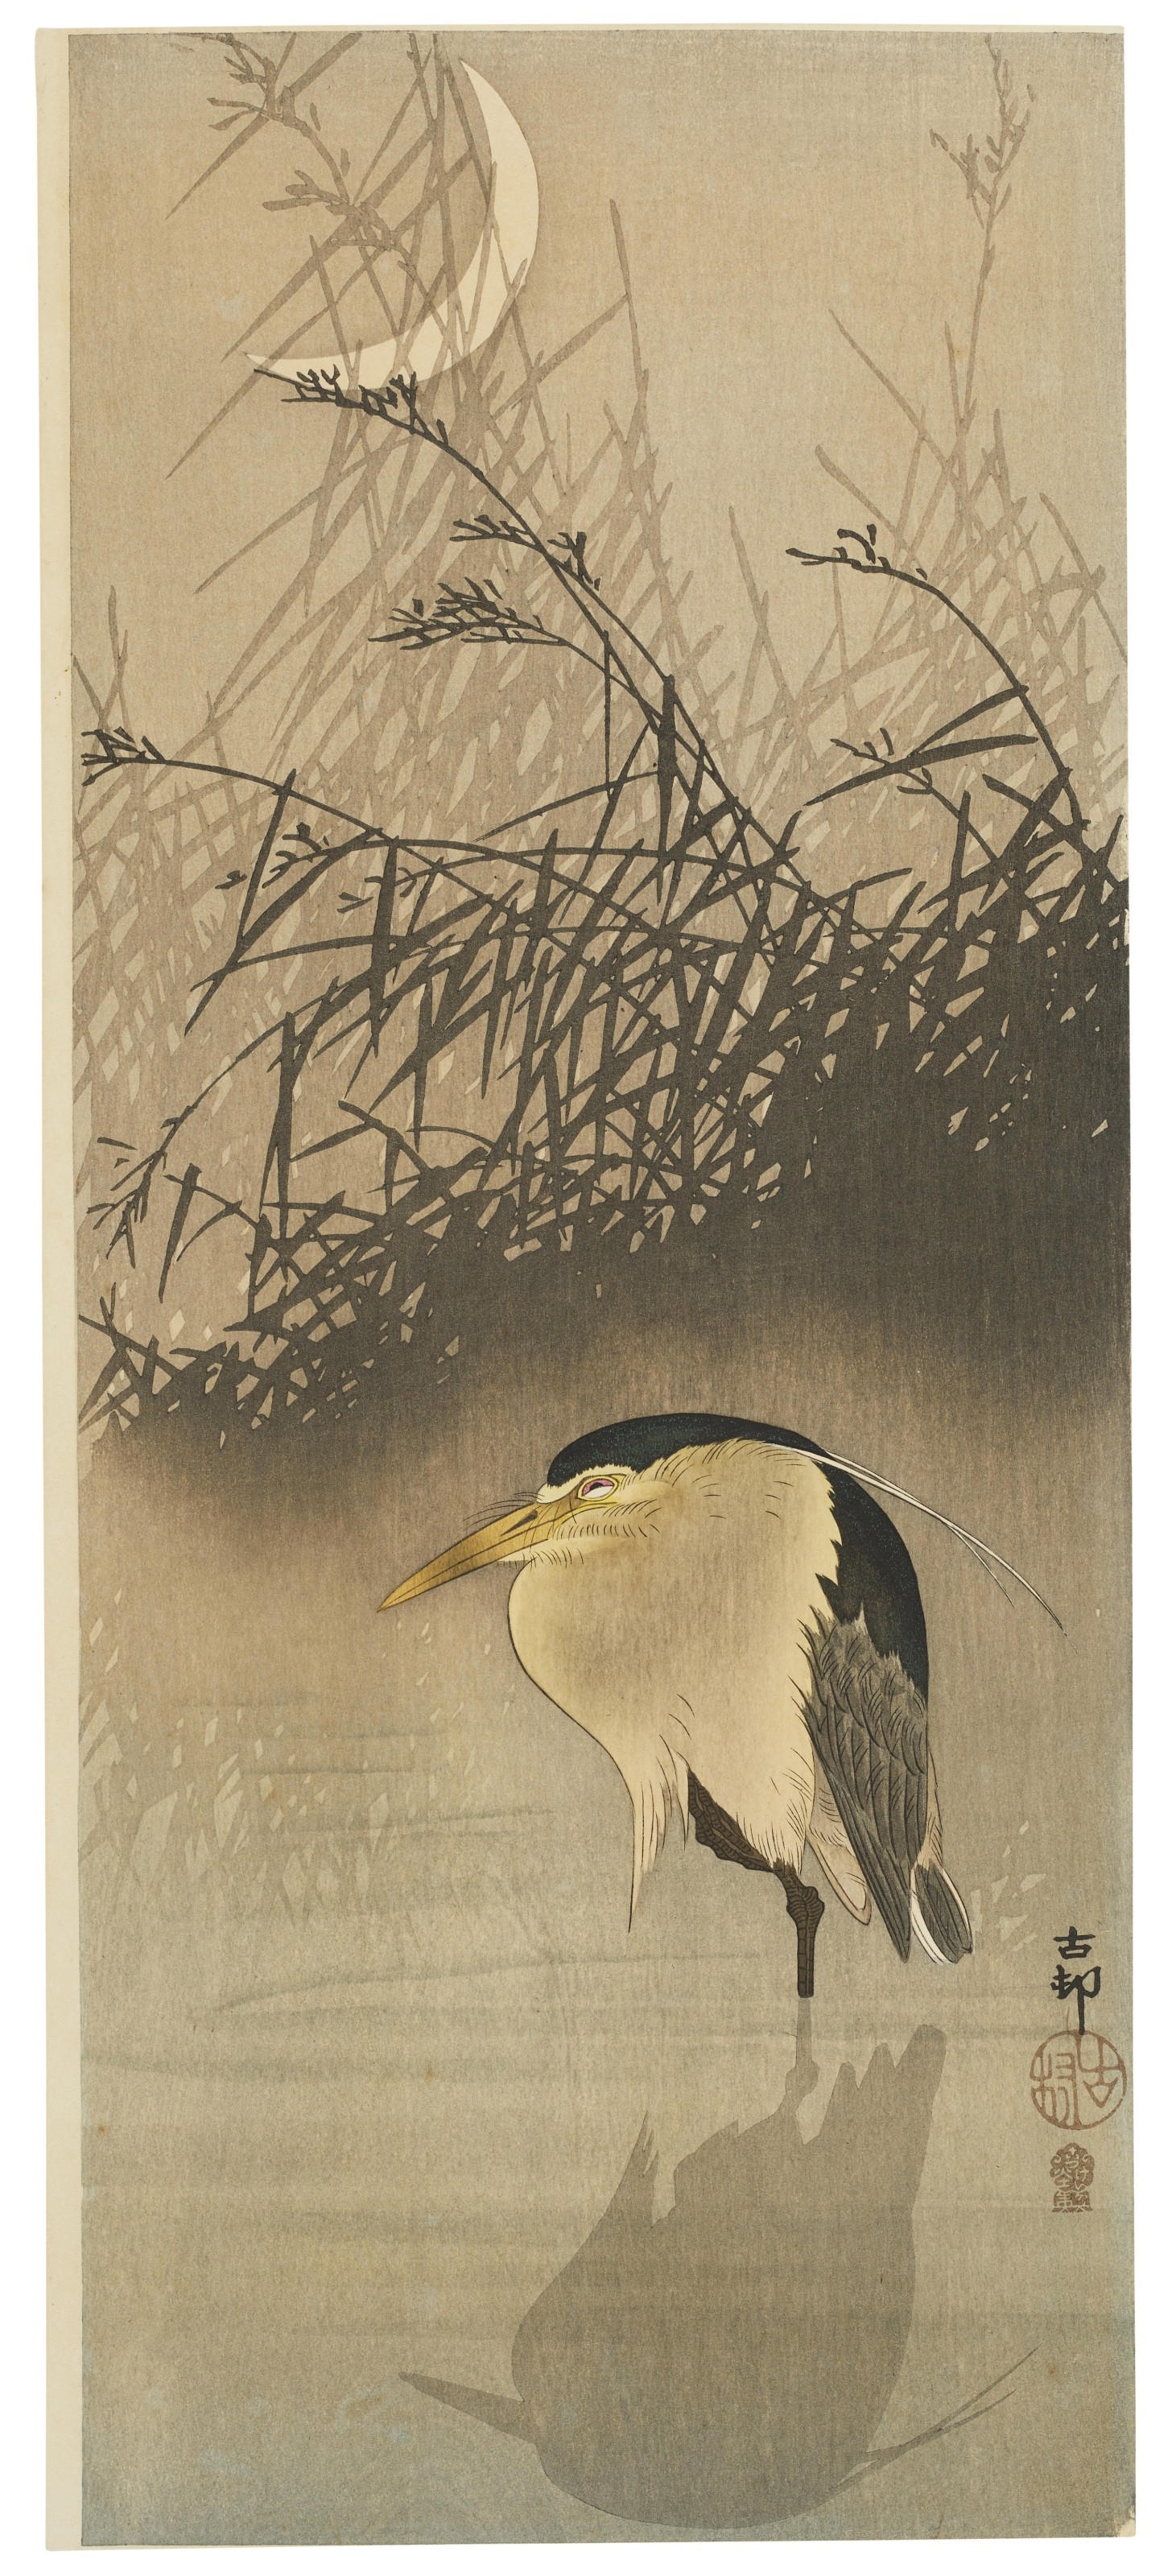 Edition Japanese Print Koson Asian Art Japan Egret on Branch 30x44 Ltd